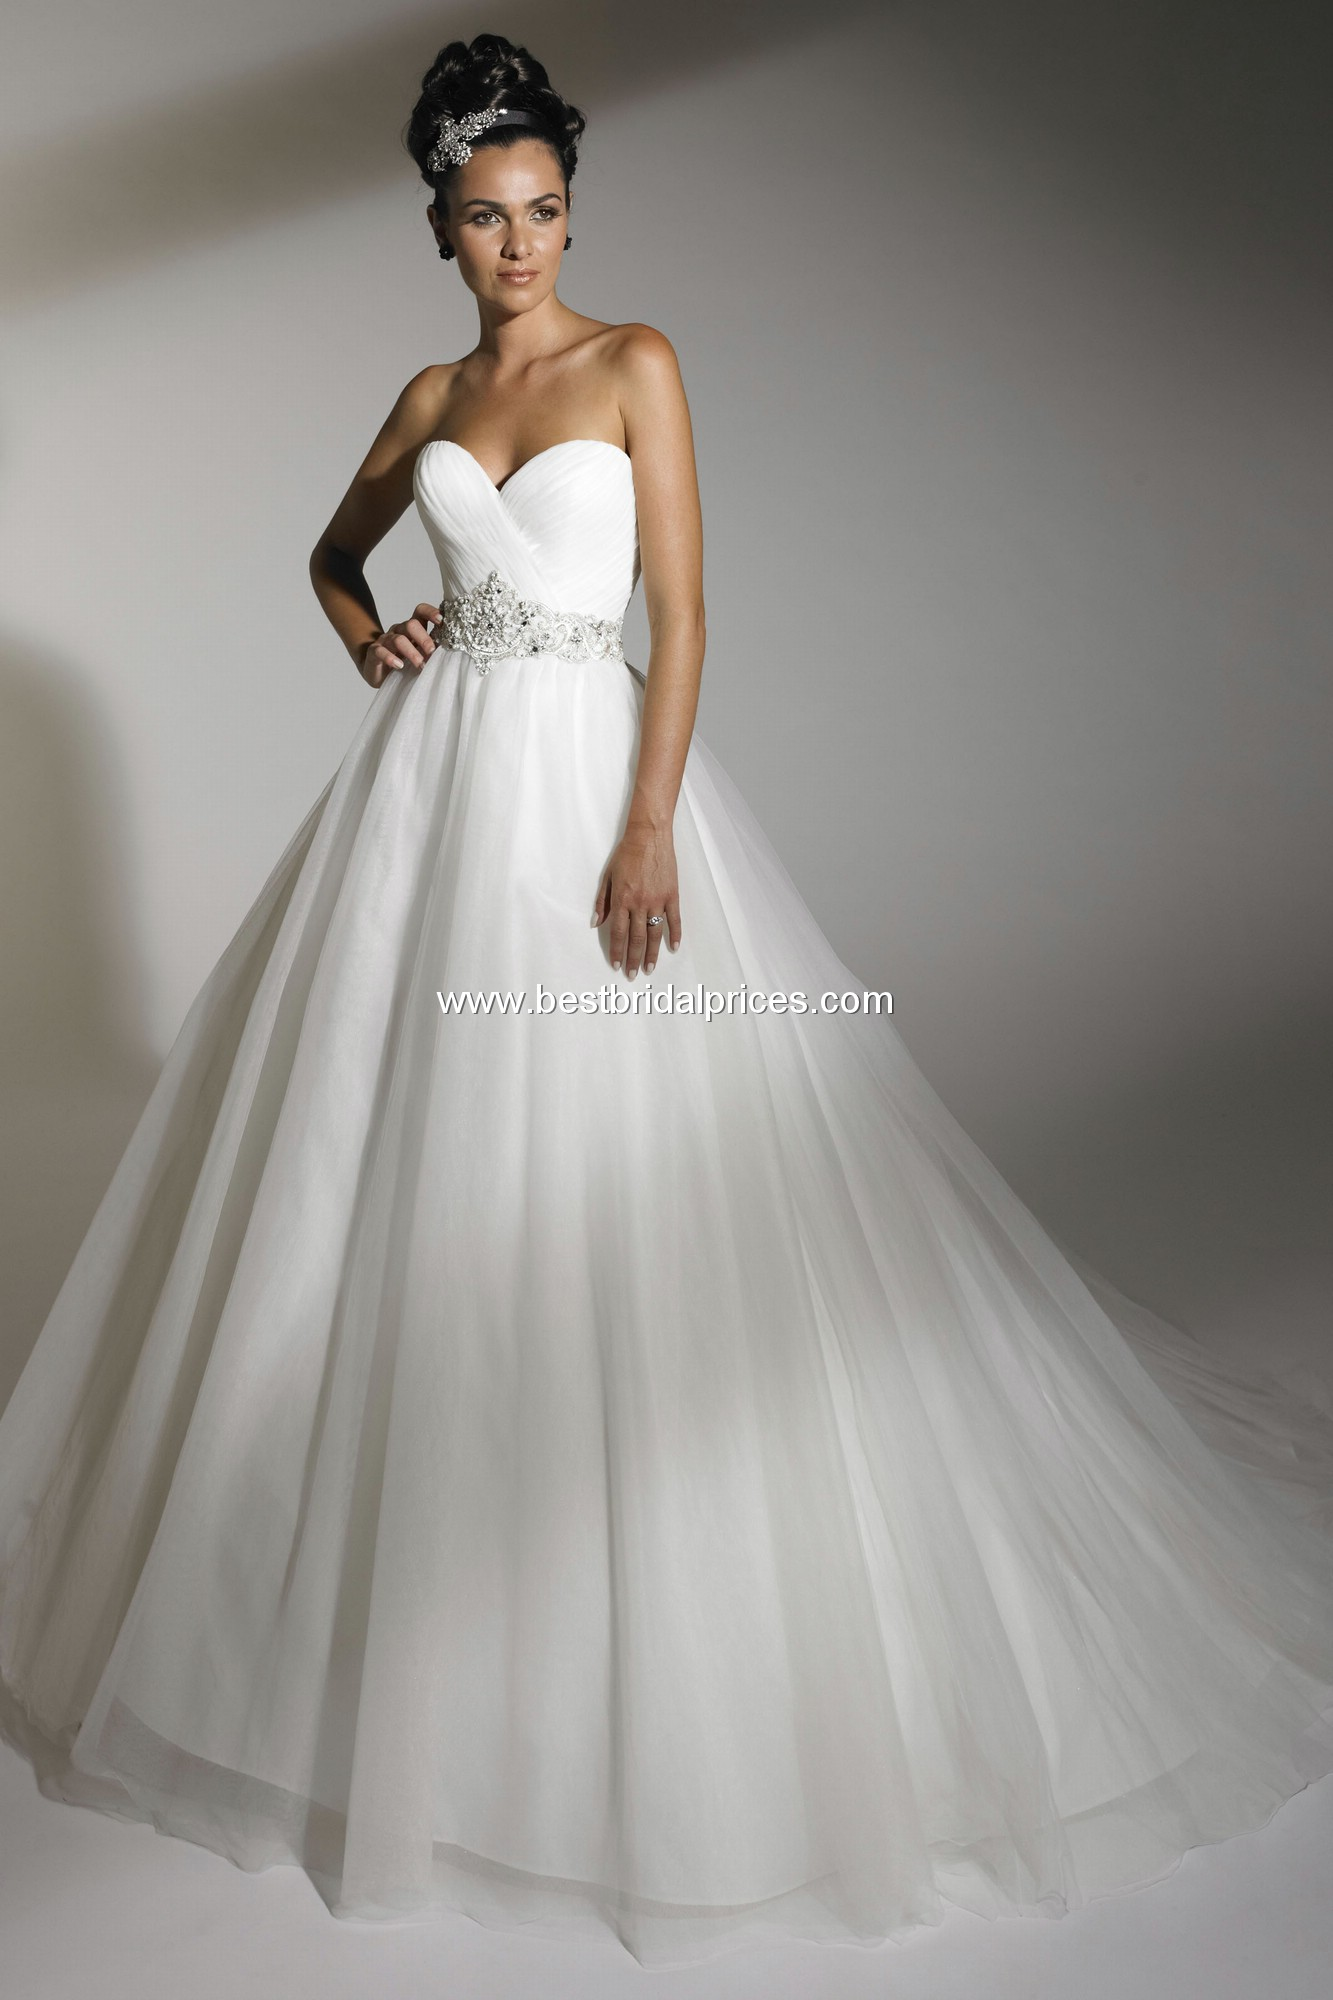 jacquelin exclusive wedding dresses photo - 1